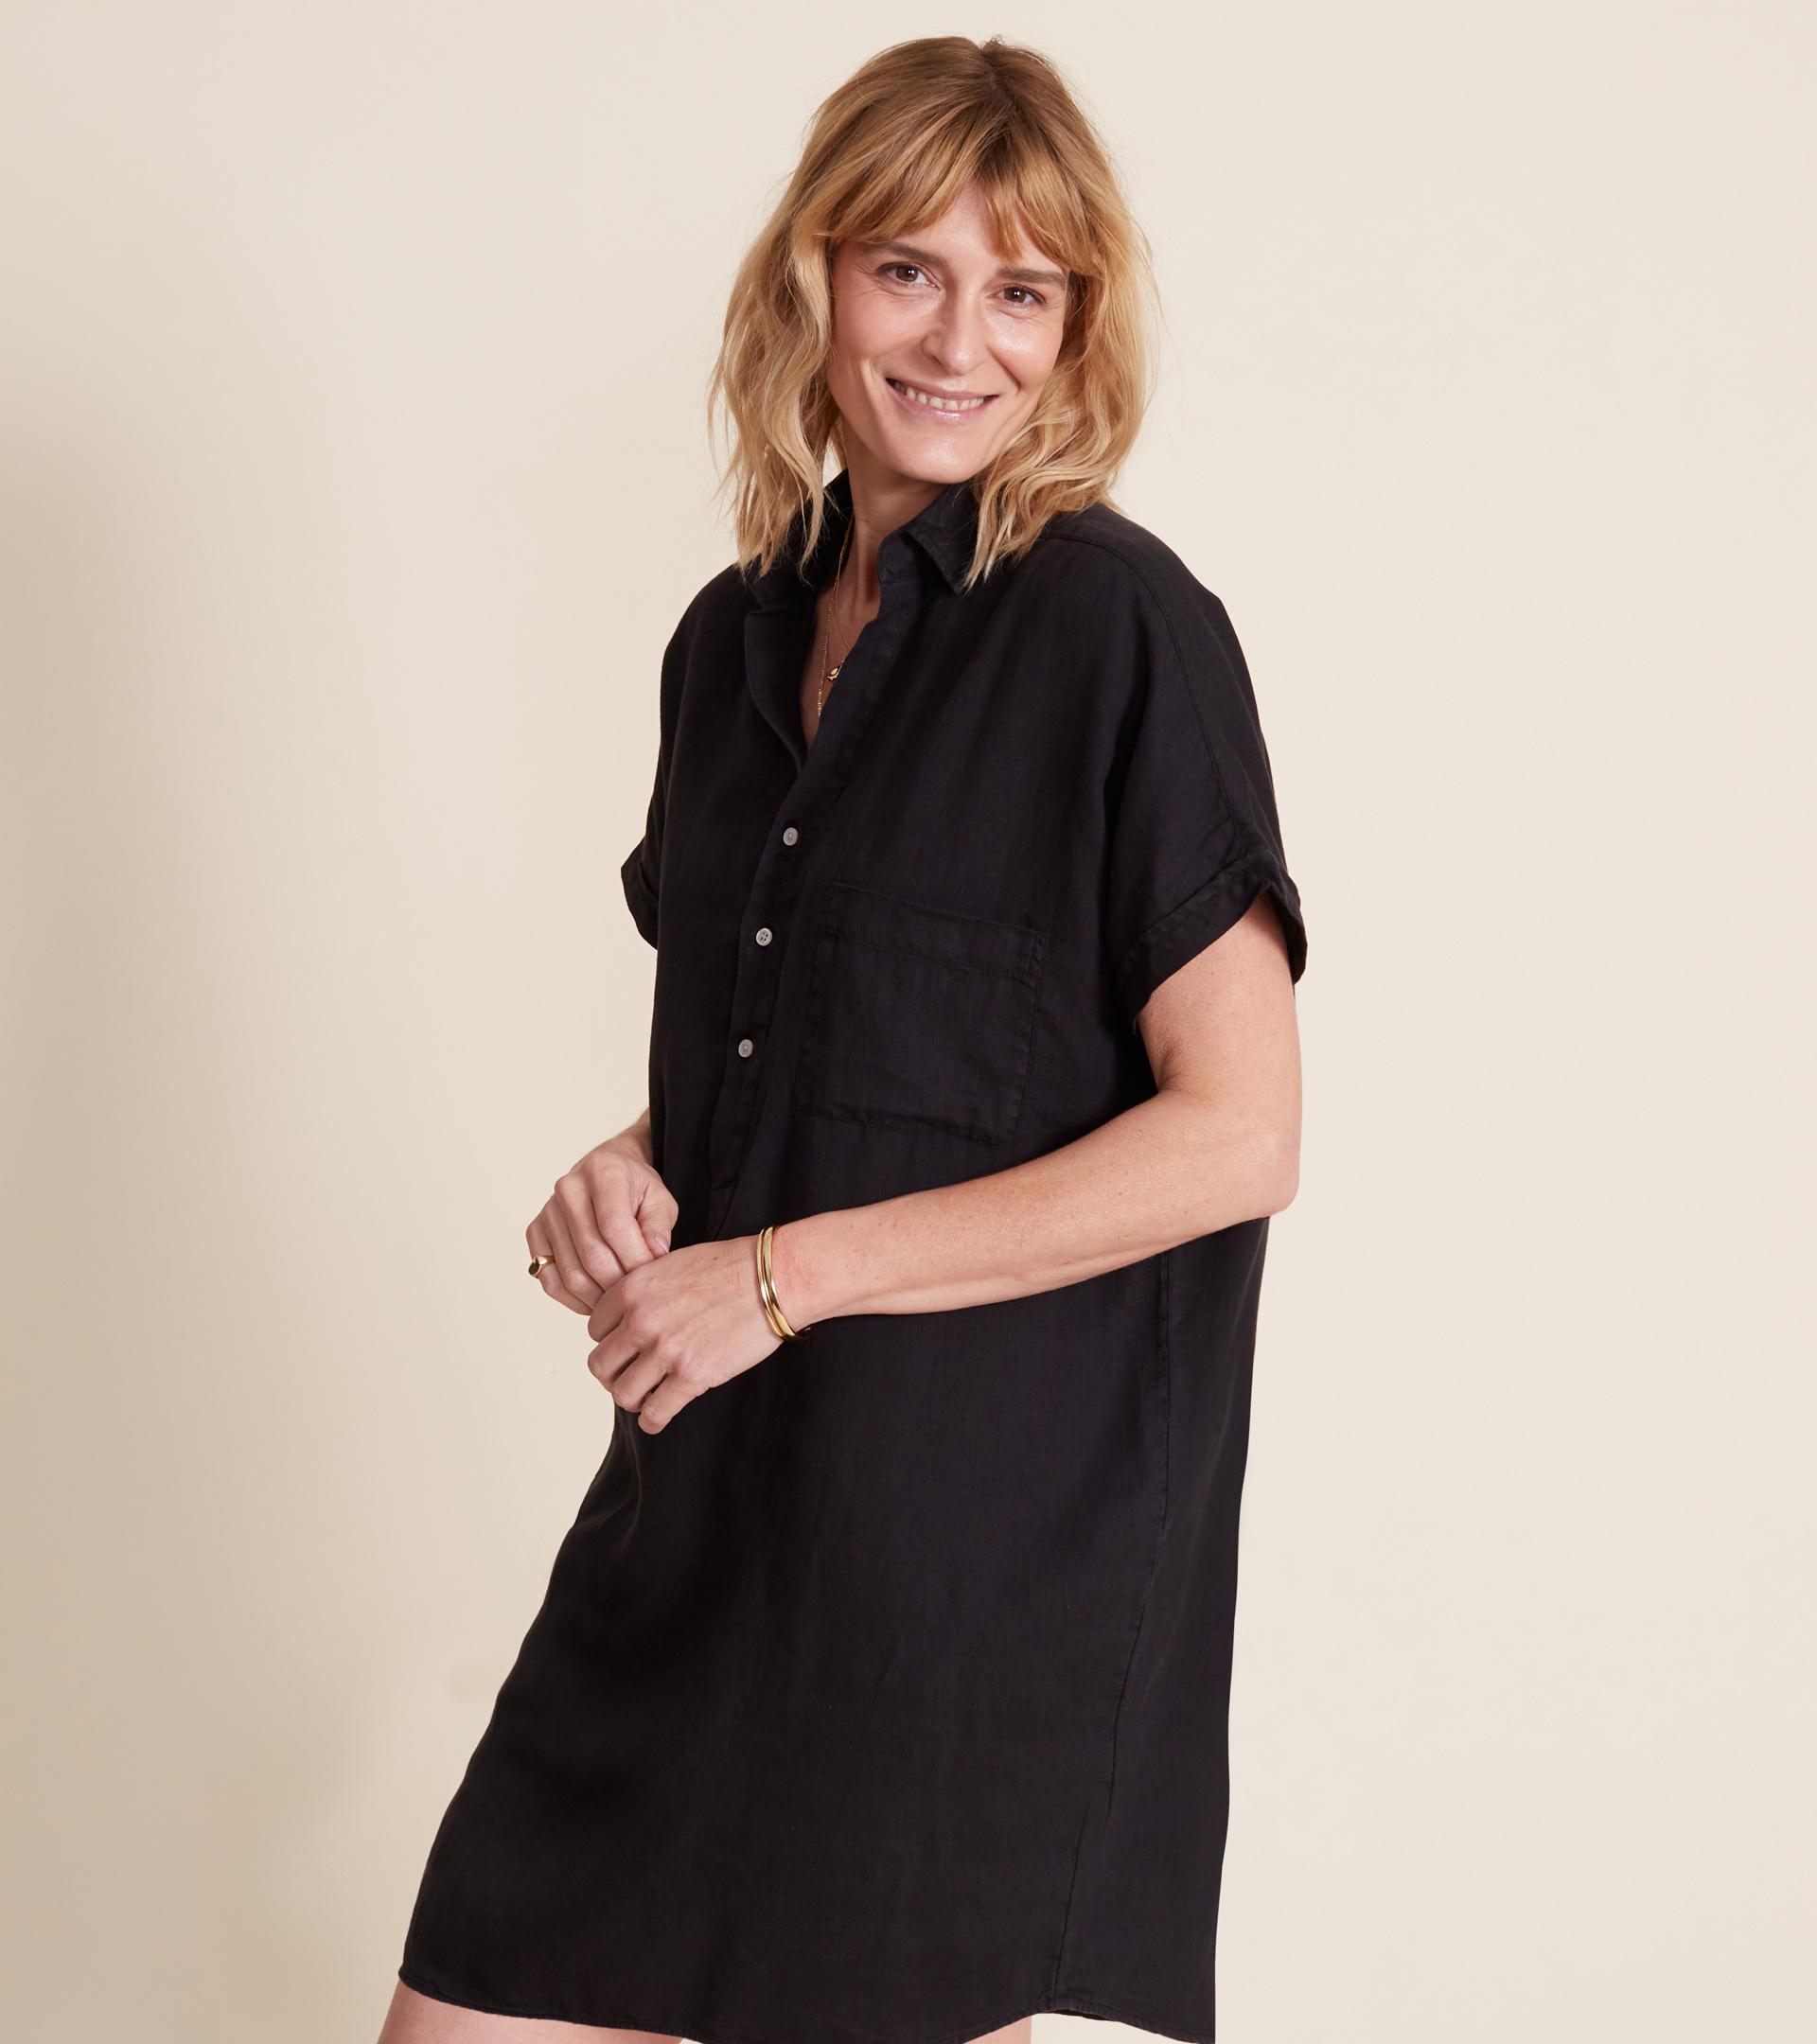 Image of The Artist Short Sleeve Dress Black, Tumbled Linen Final Sale